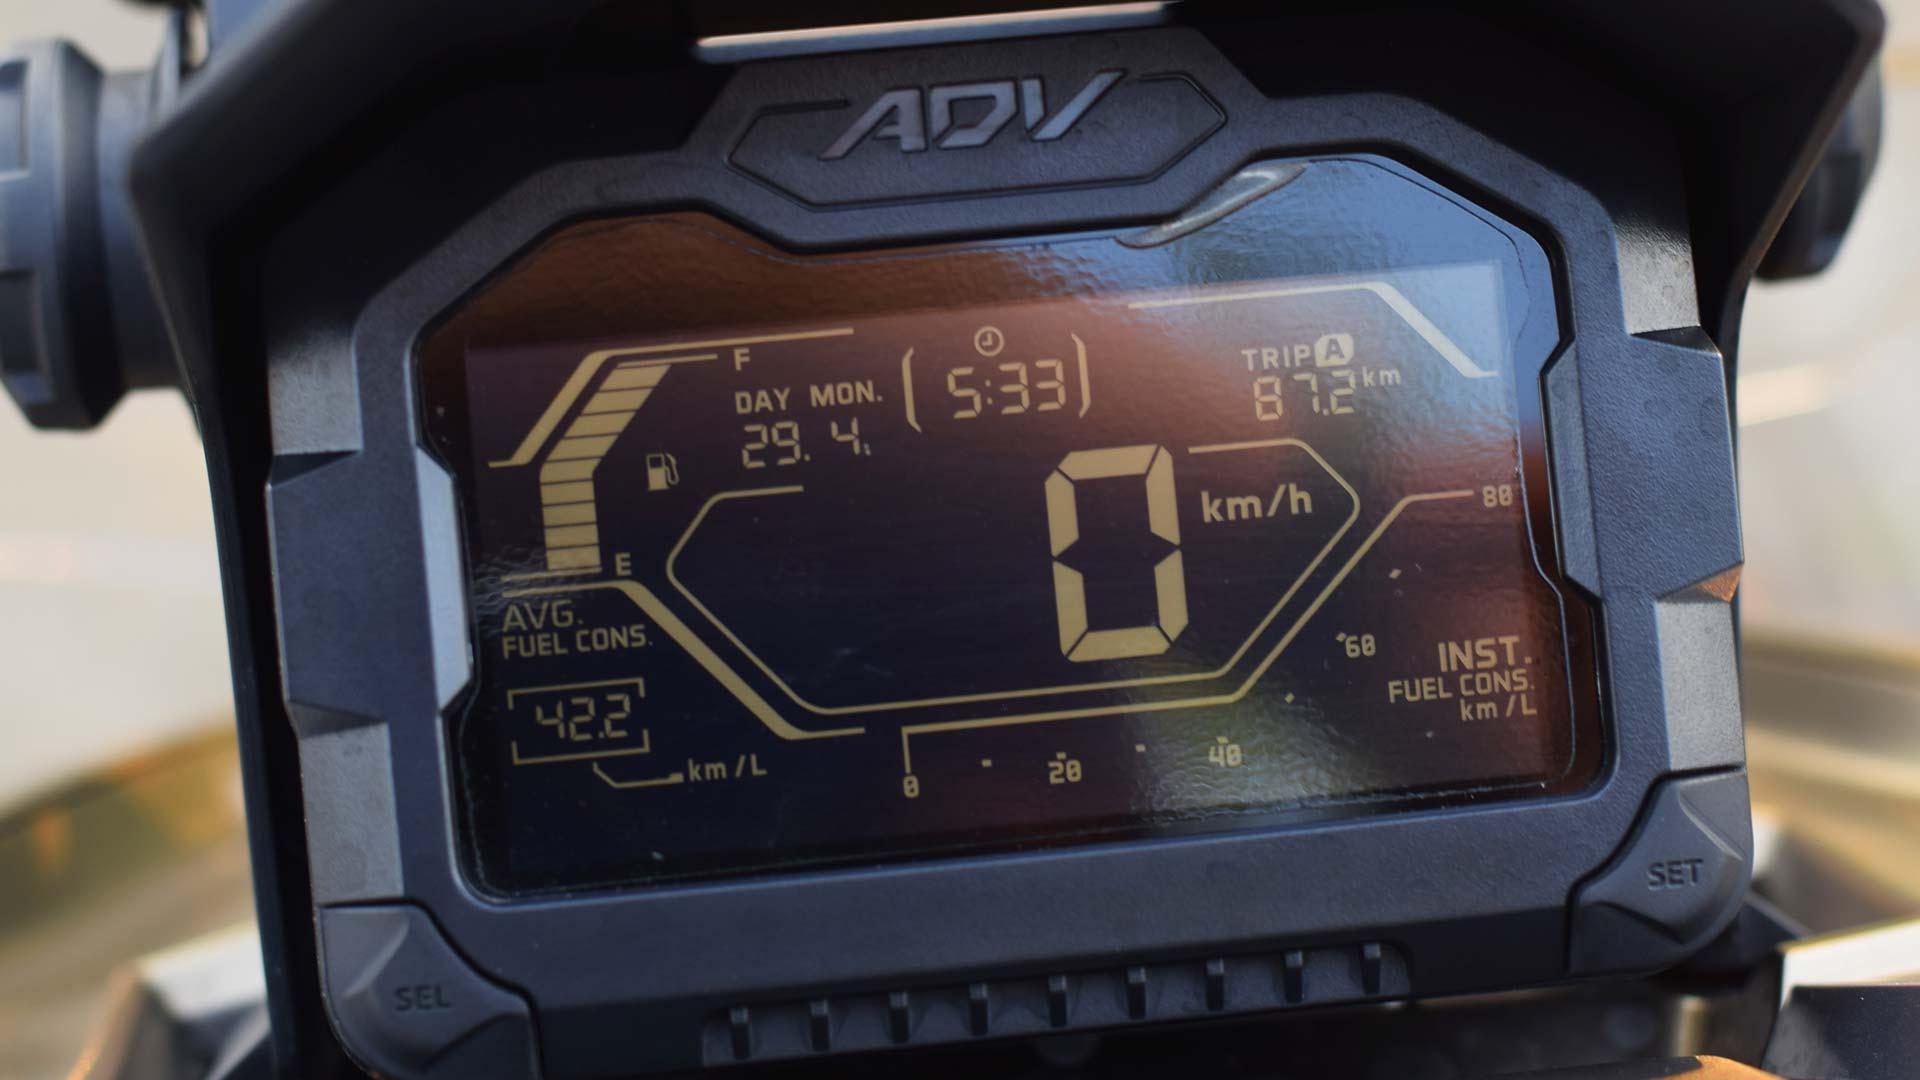 Honda ADV 150 Dashboard